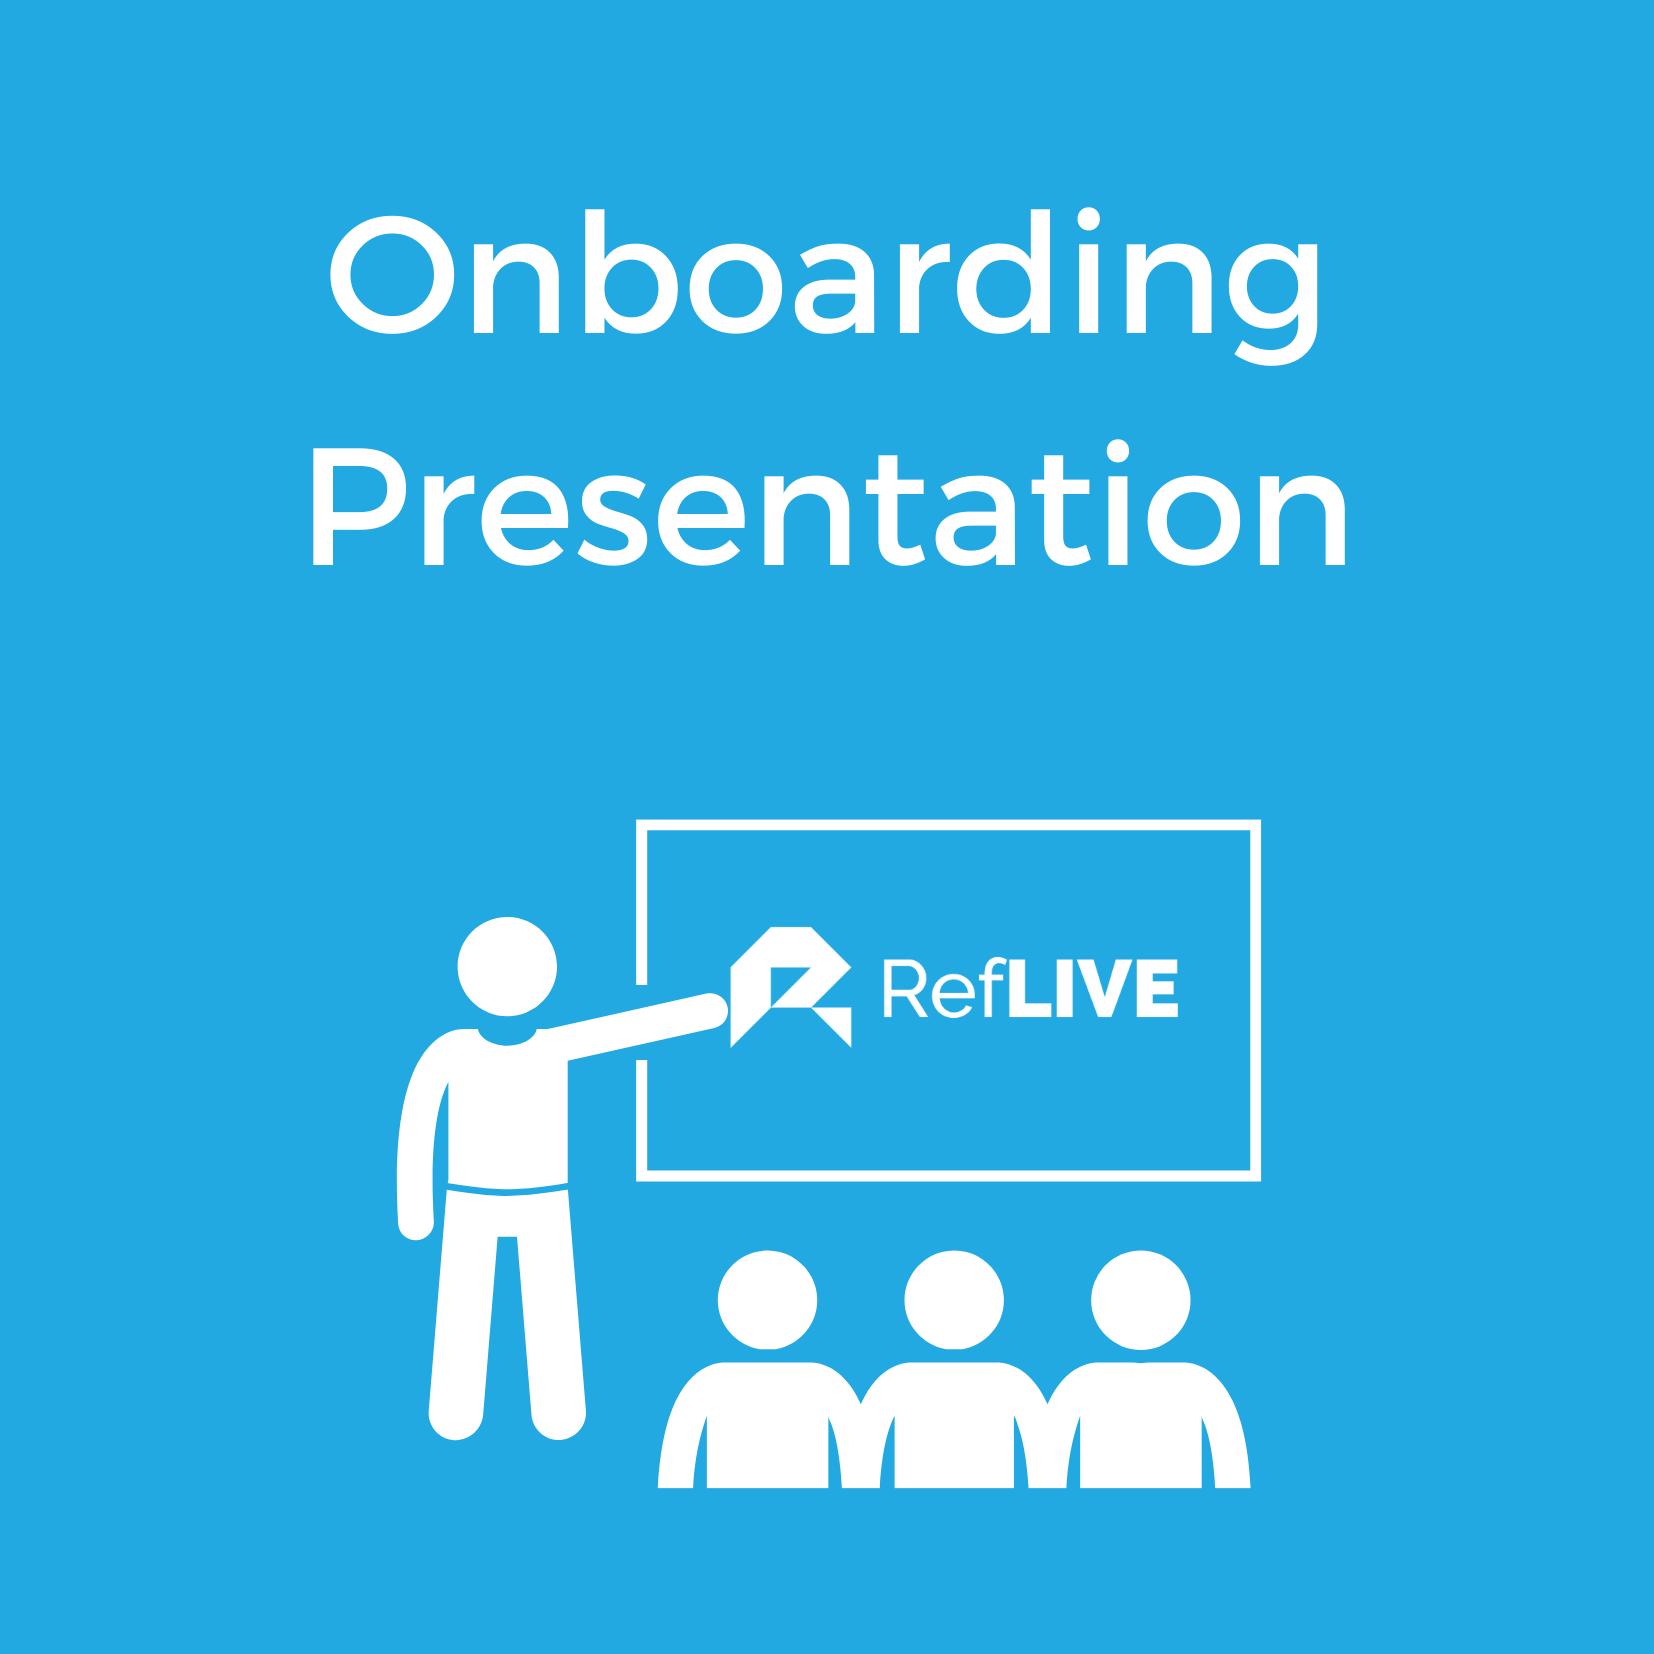 Onboarding Presentation